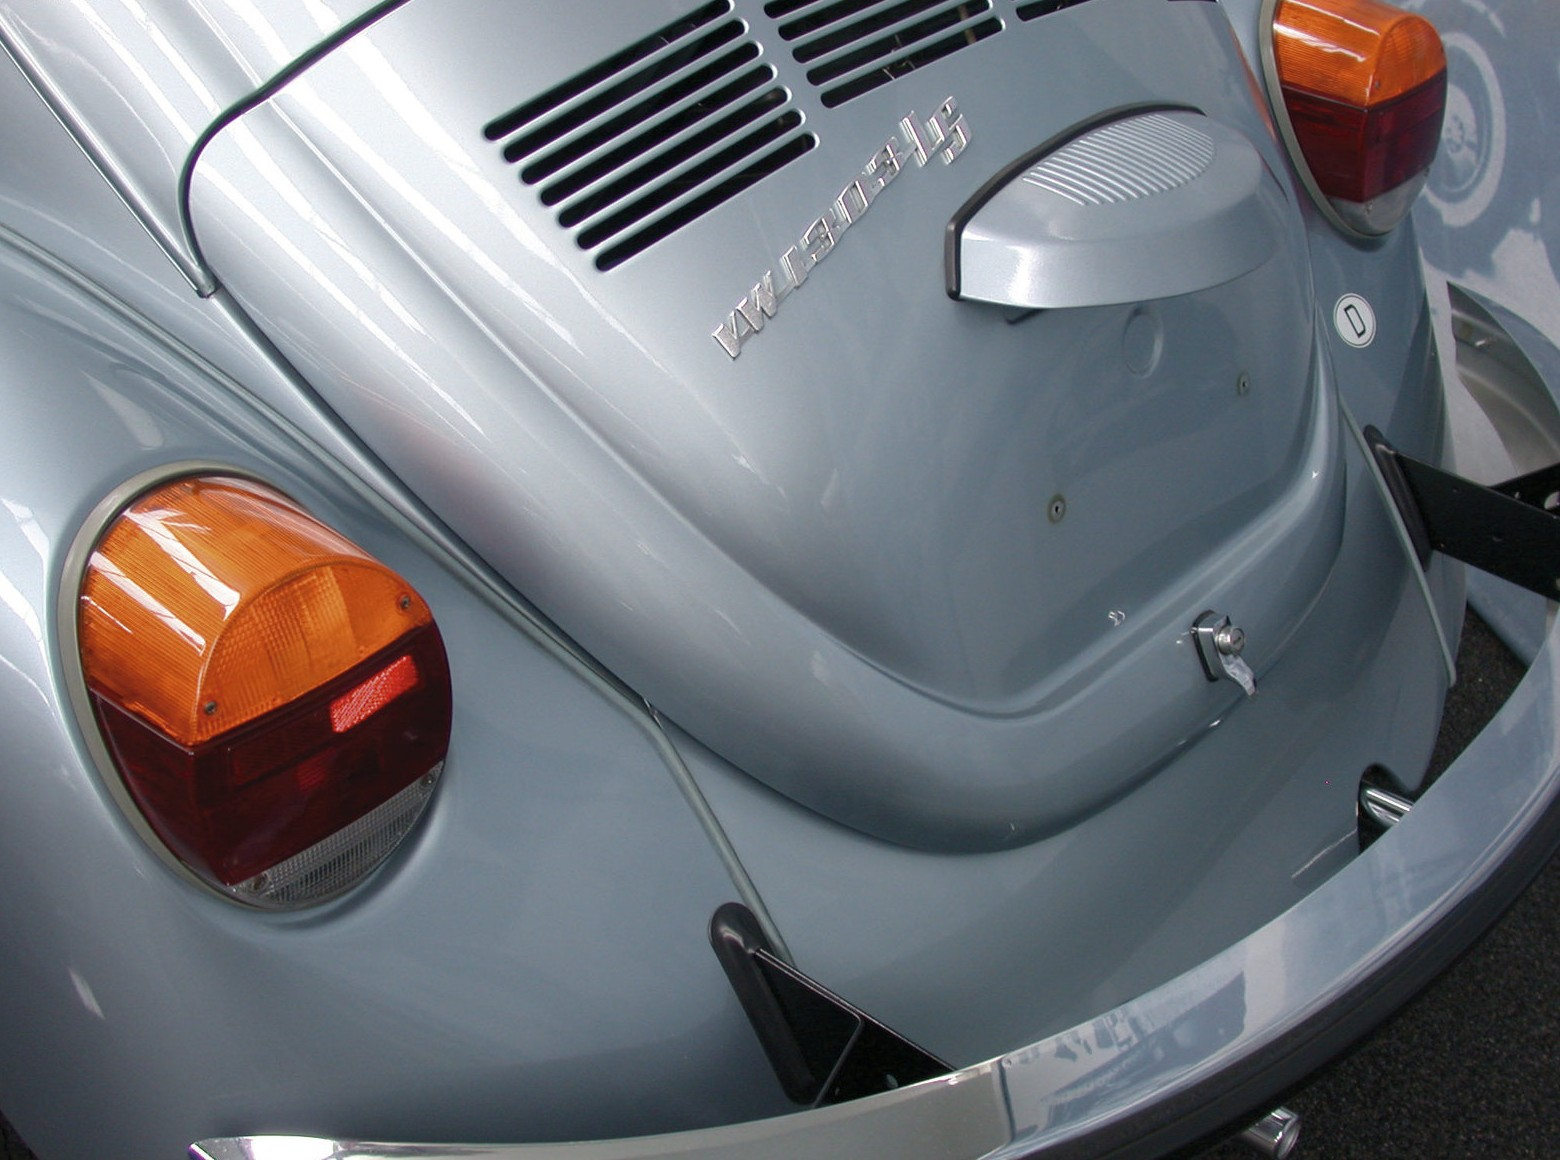 http://3.bp.blogspot.com/-t13jjIB-Ves/UVgjszUz3CI/AAAAAAAACLk/Y_pBwLOWKaQ/s1600/Volkswagen-Beetle_1938_1600x1200_wallpaper_21.jpg